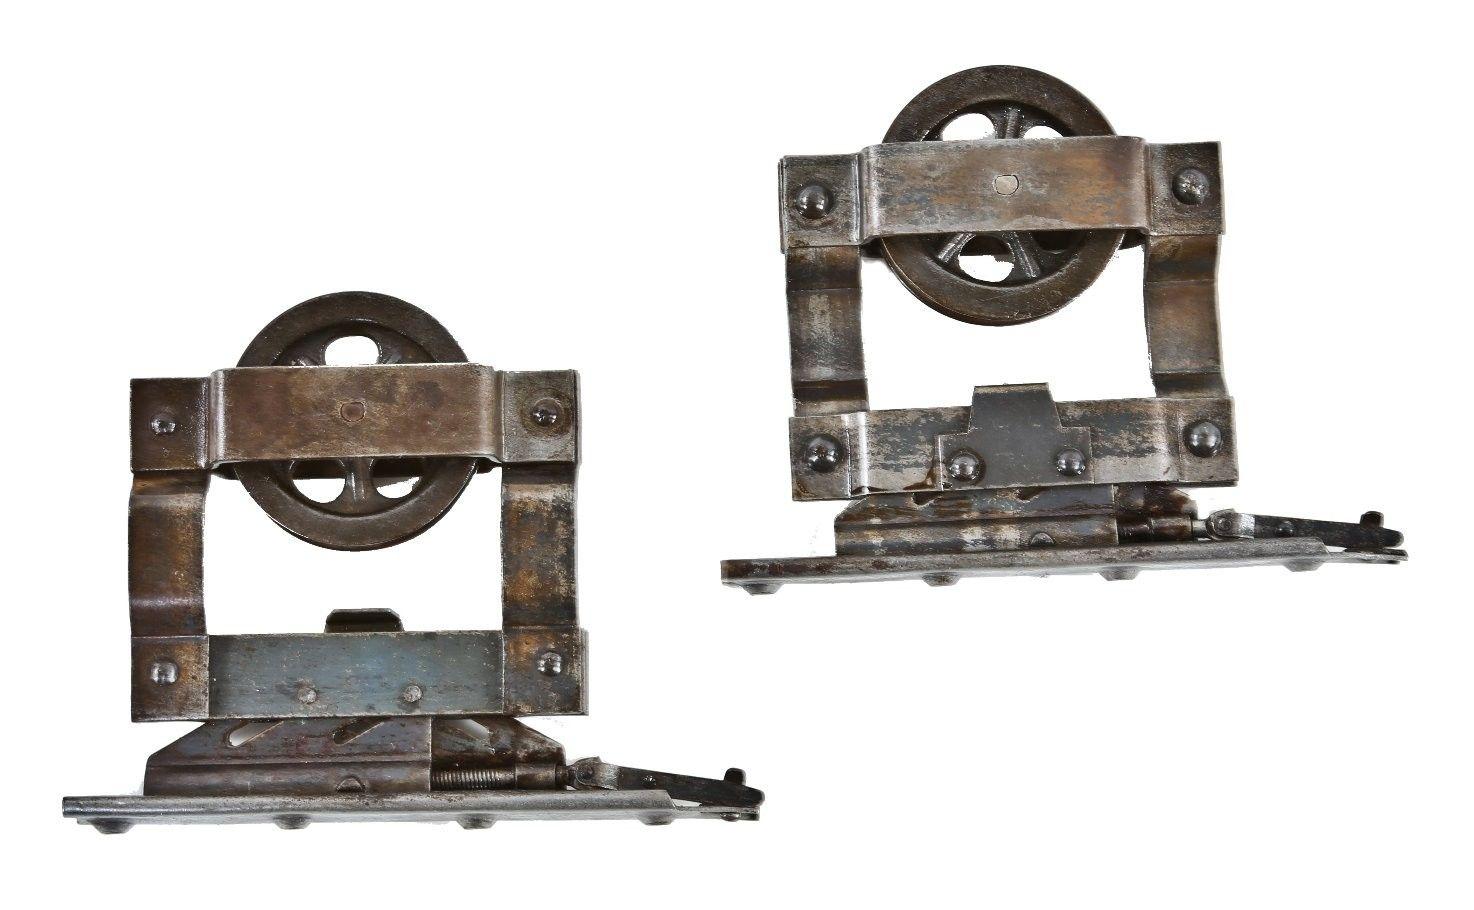 Antique Pocket Door Tracks And Rollers - Antique Pocket Door Tracks And Rollers Http://retrocomputinggeek